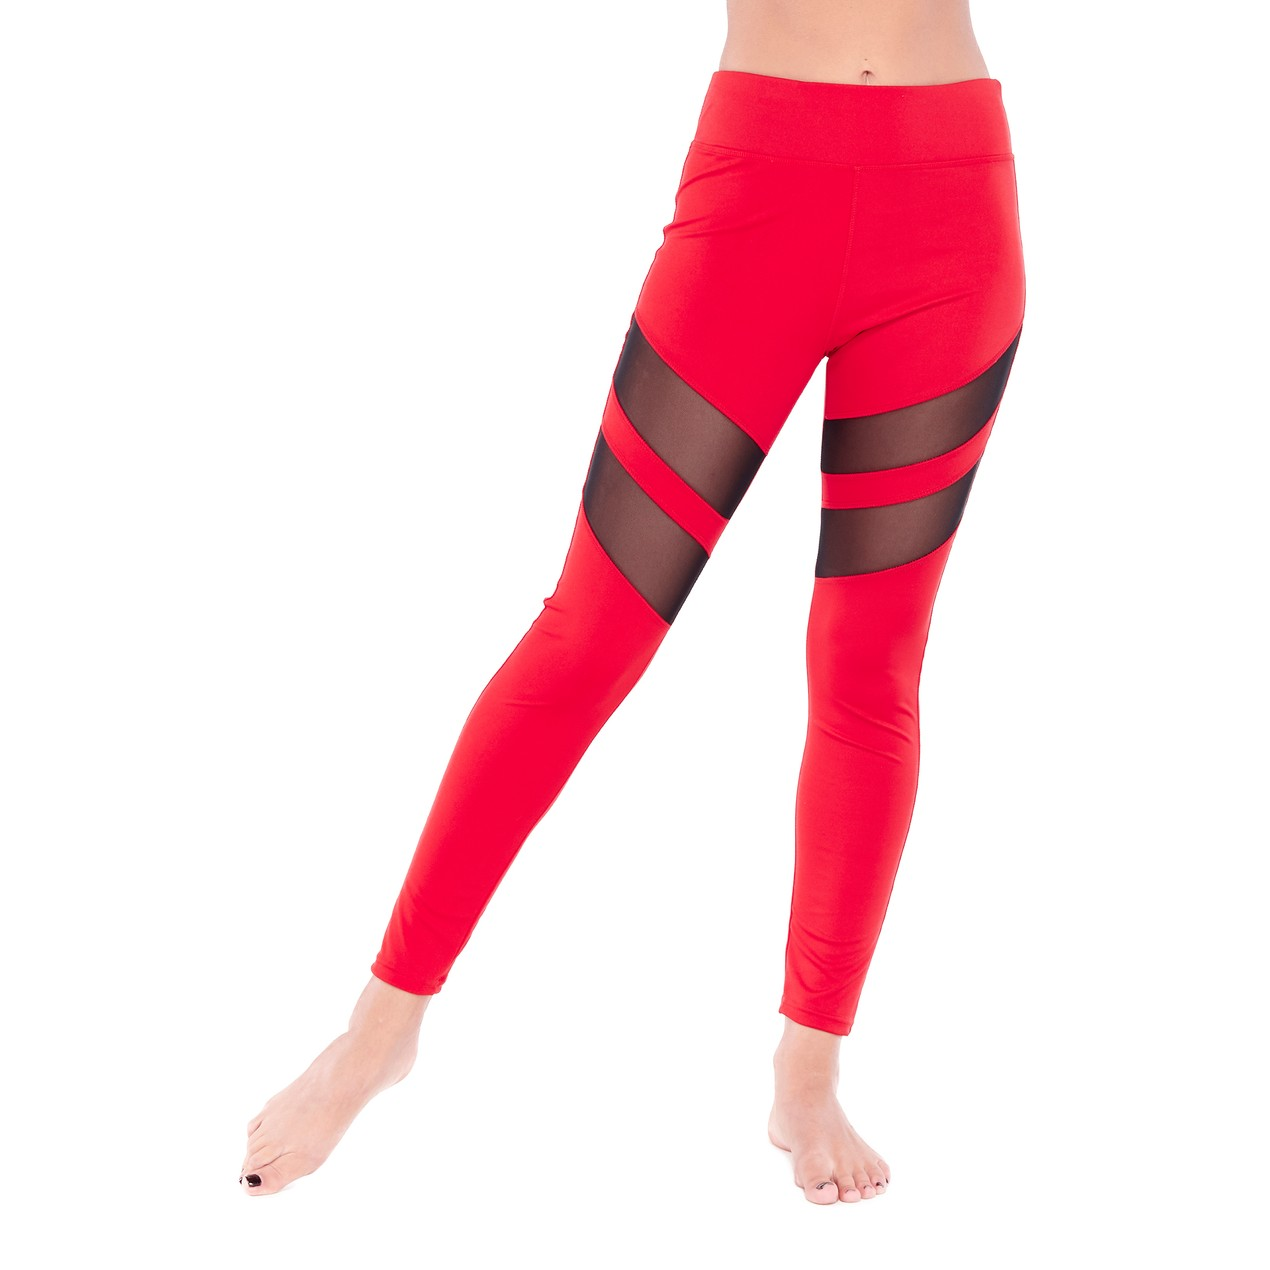 Electric Yoga Tummy Tuck Mesh Racer Legging - Tanga